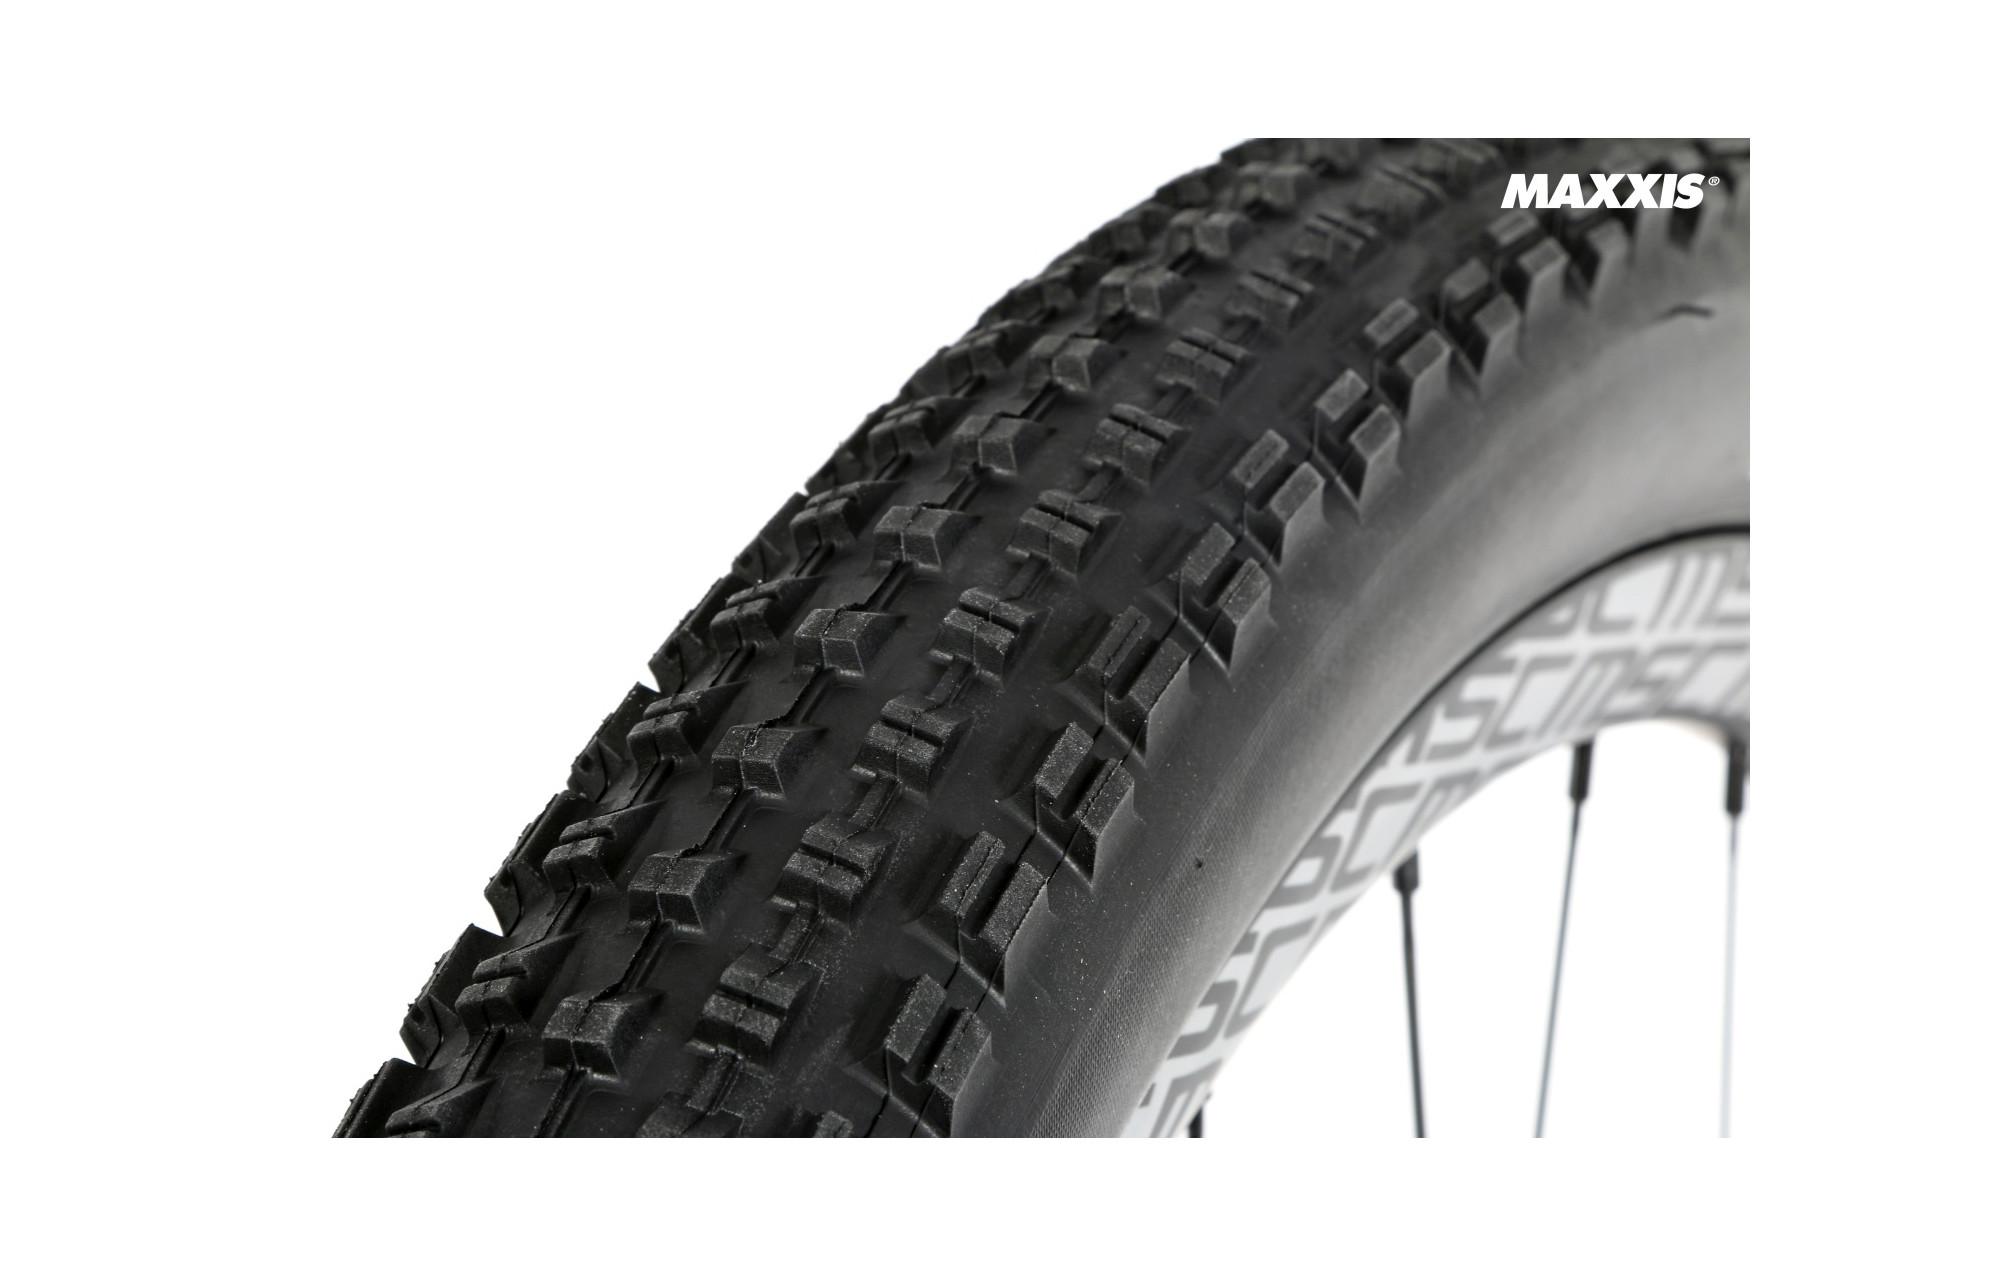 maxxis pneu race tt dual 60a 62a exo tubeless ready souple tb96822000. Black Bedroom Furniture Sets. Home Design Ideas